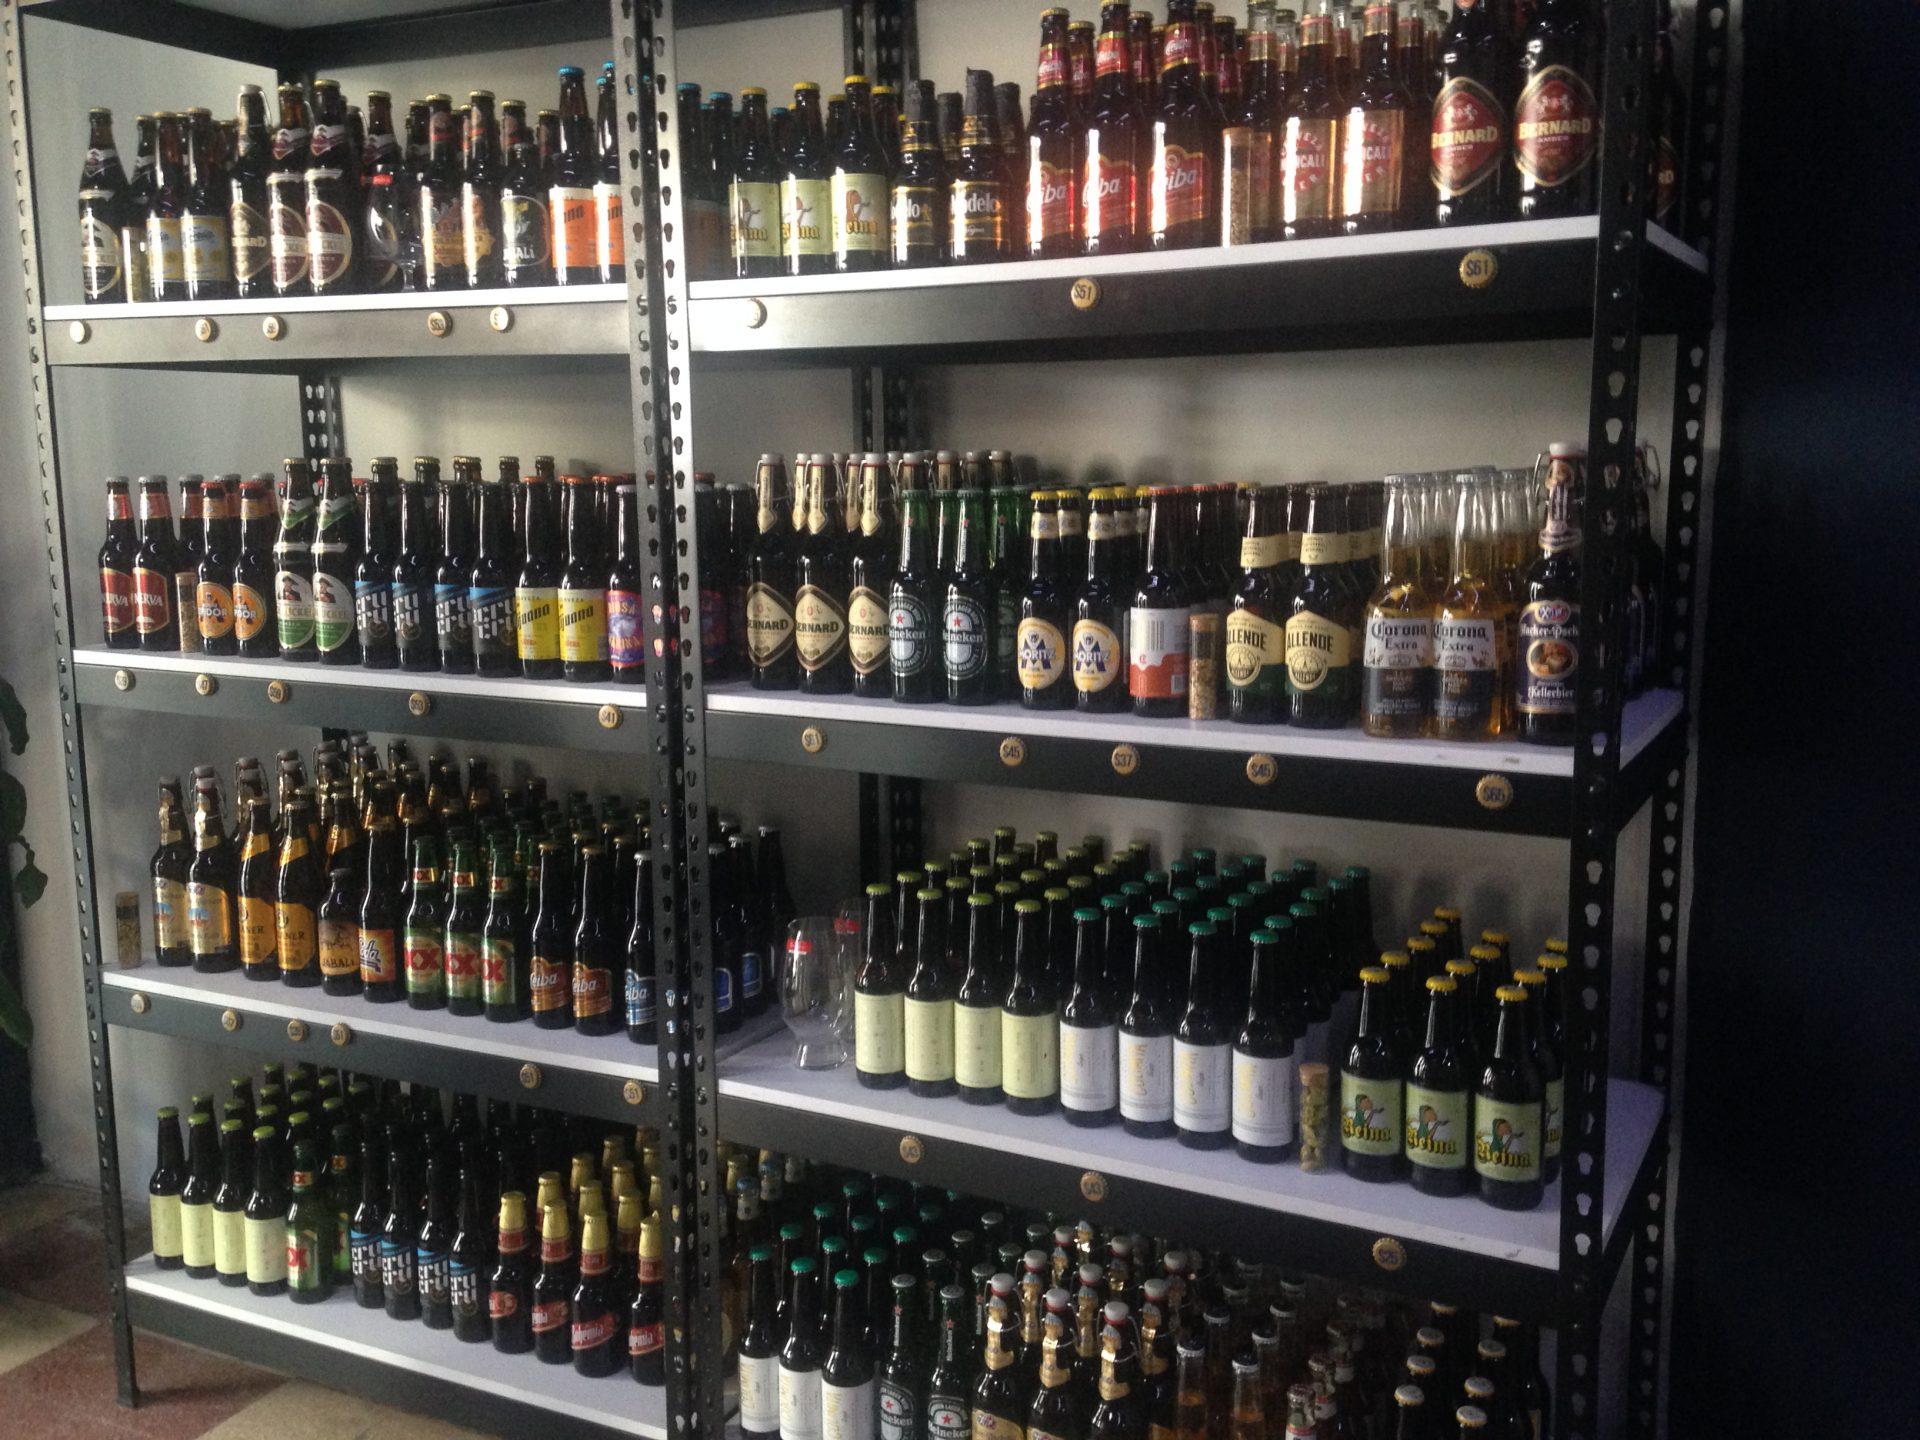 Bodega, nuevo espacio cervecero